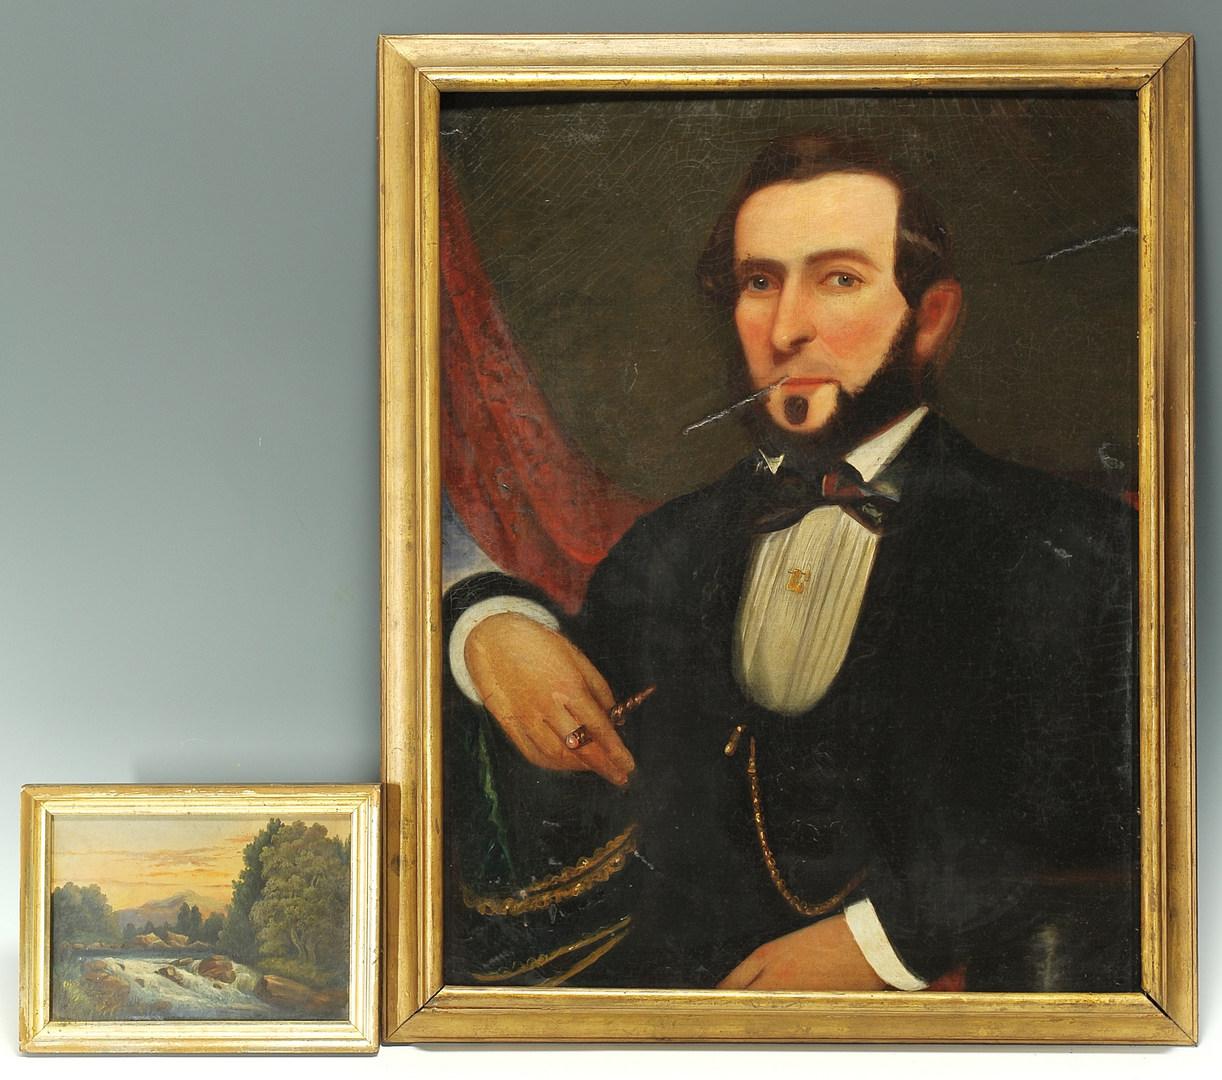 Lot 348: East TN portrait of gentleman and landscape oil